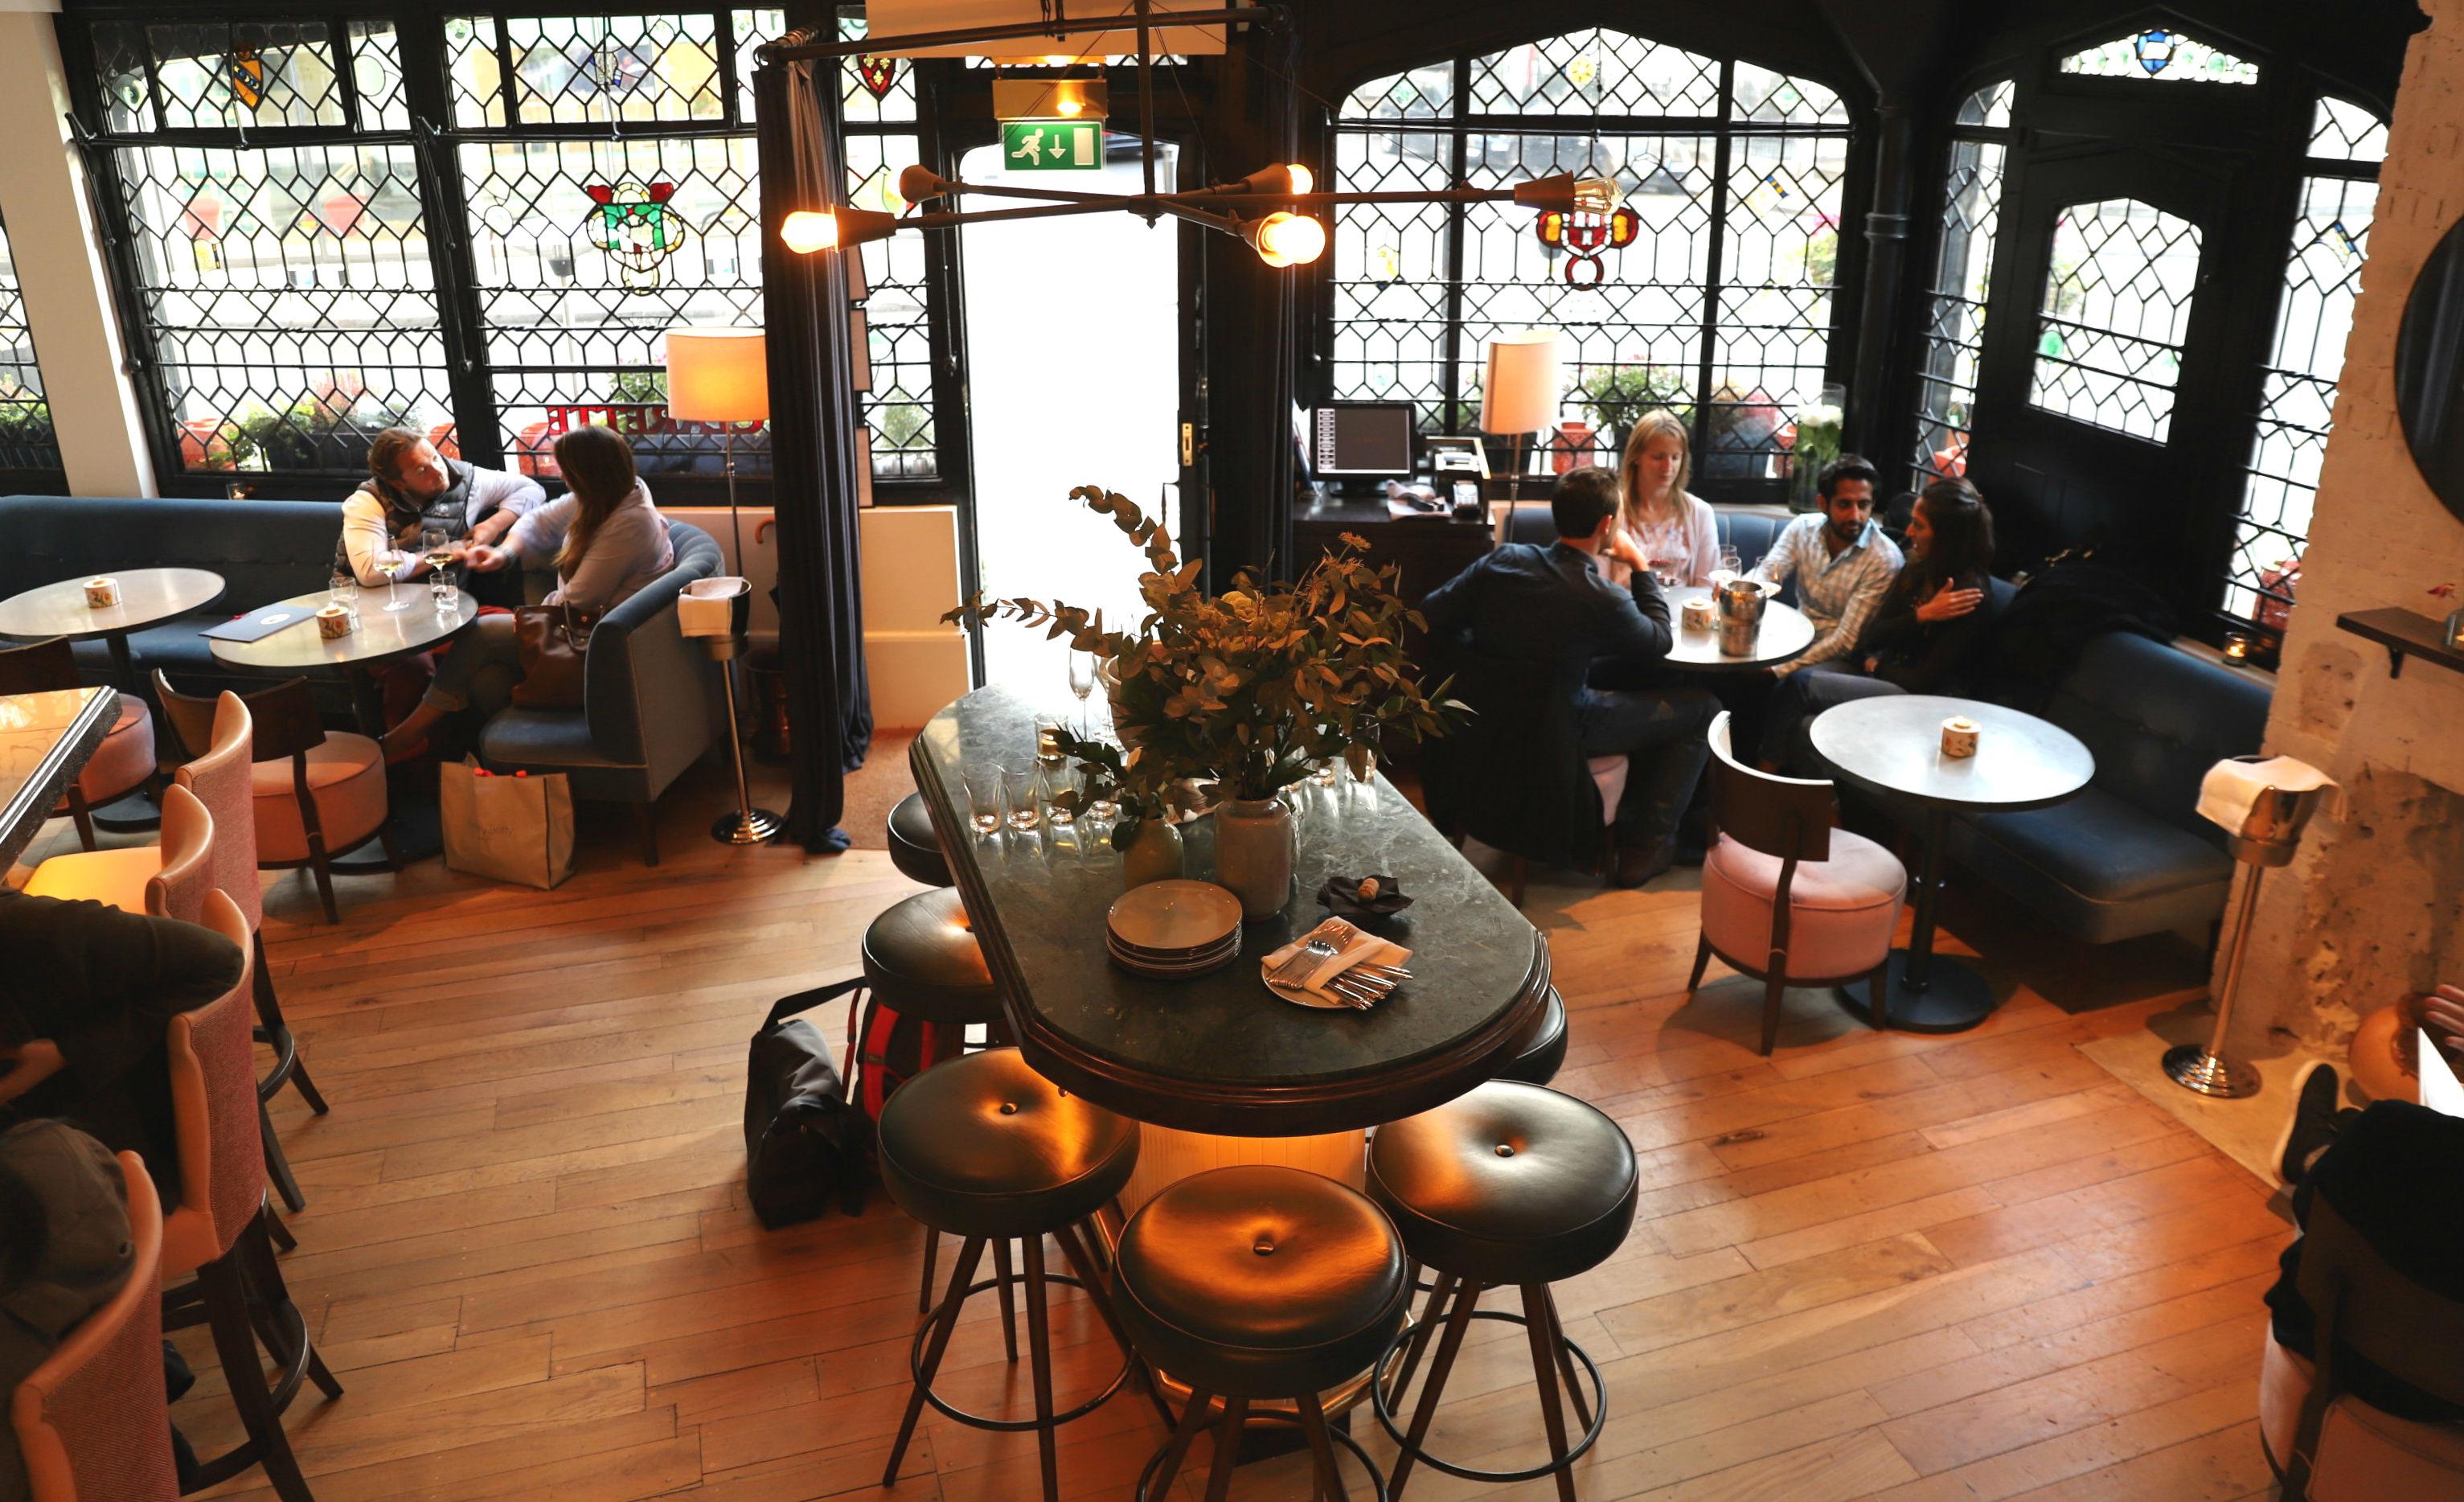 The restaurant Clarette in London